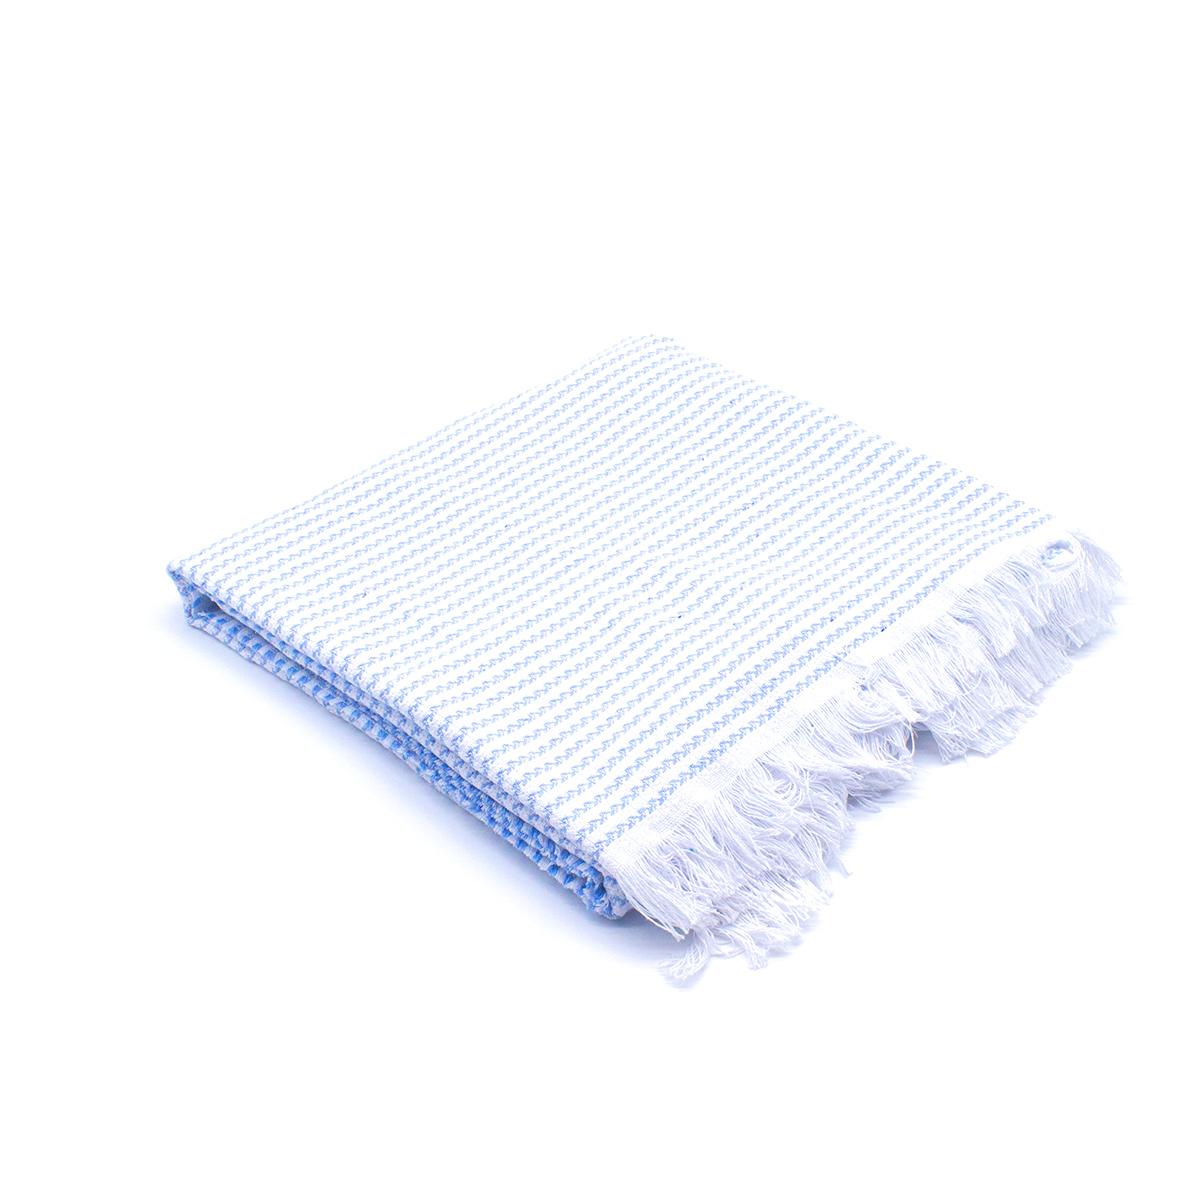 Одеяло Elephanta 100% памук